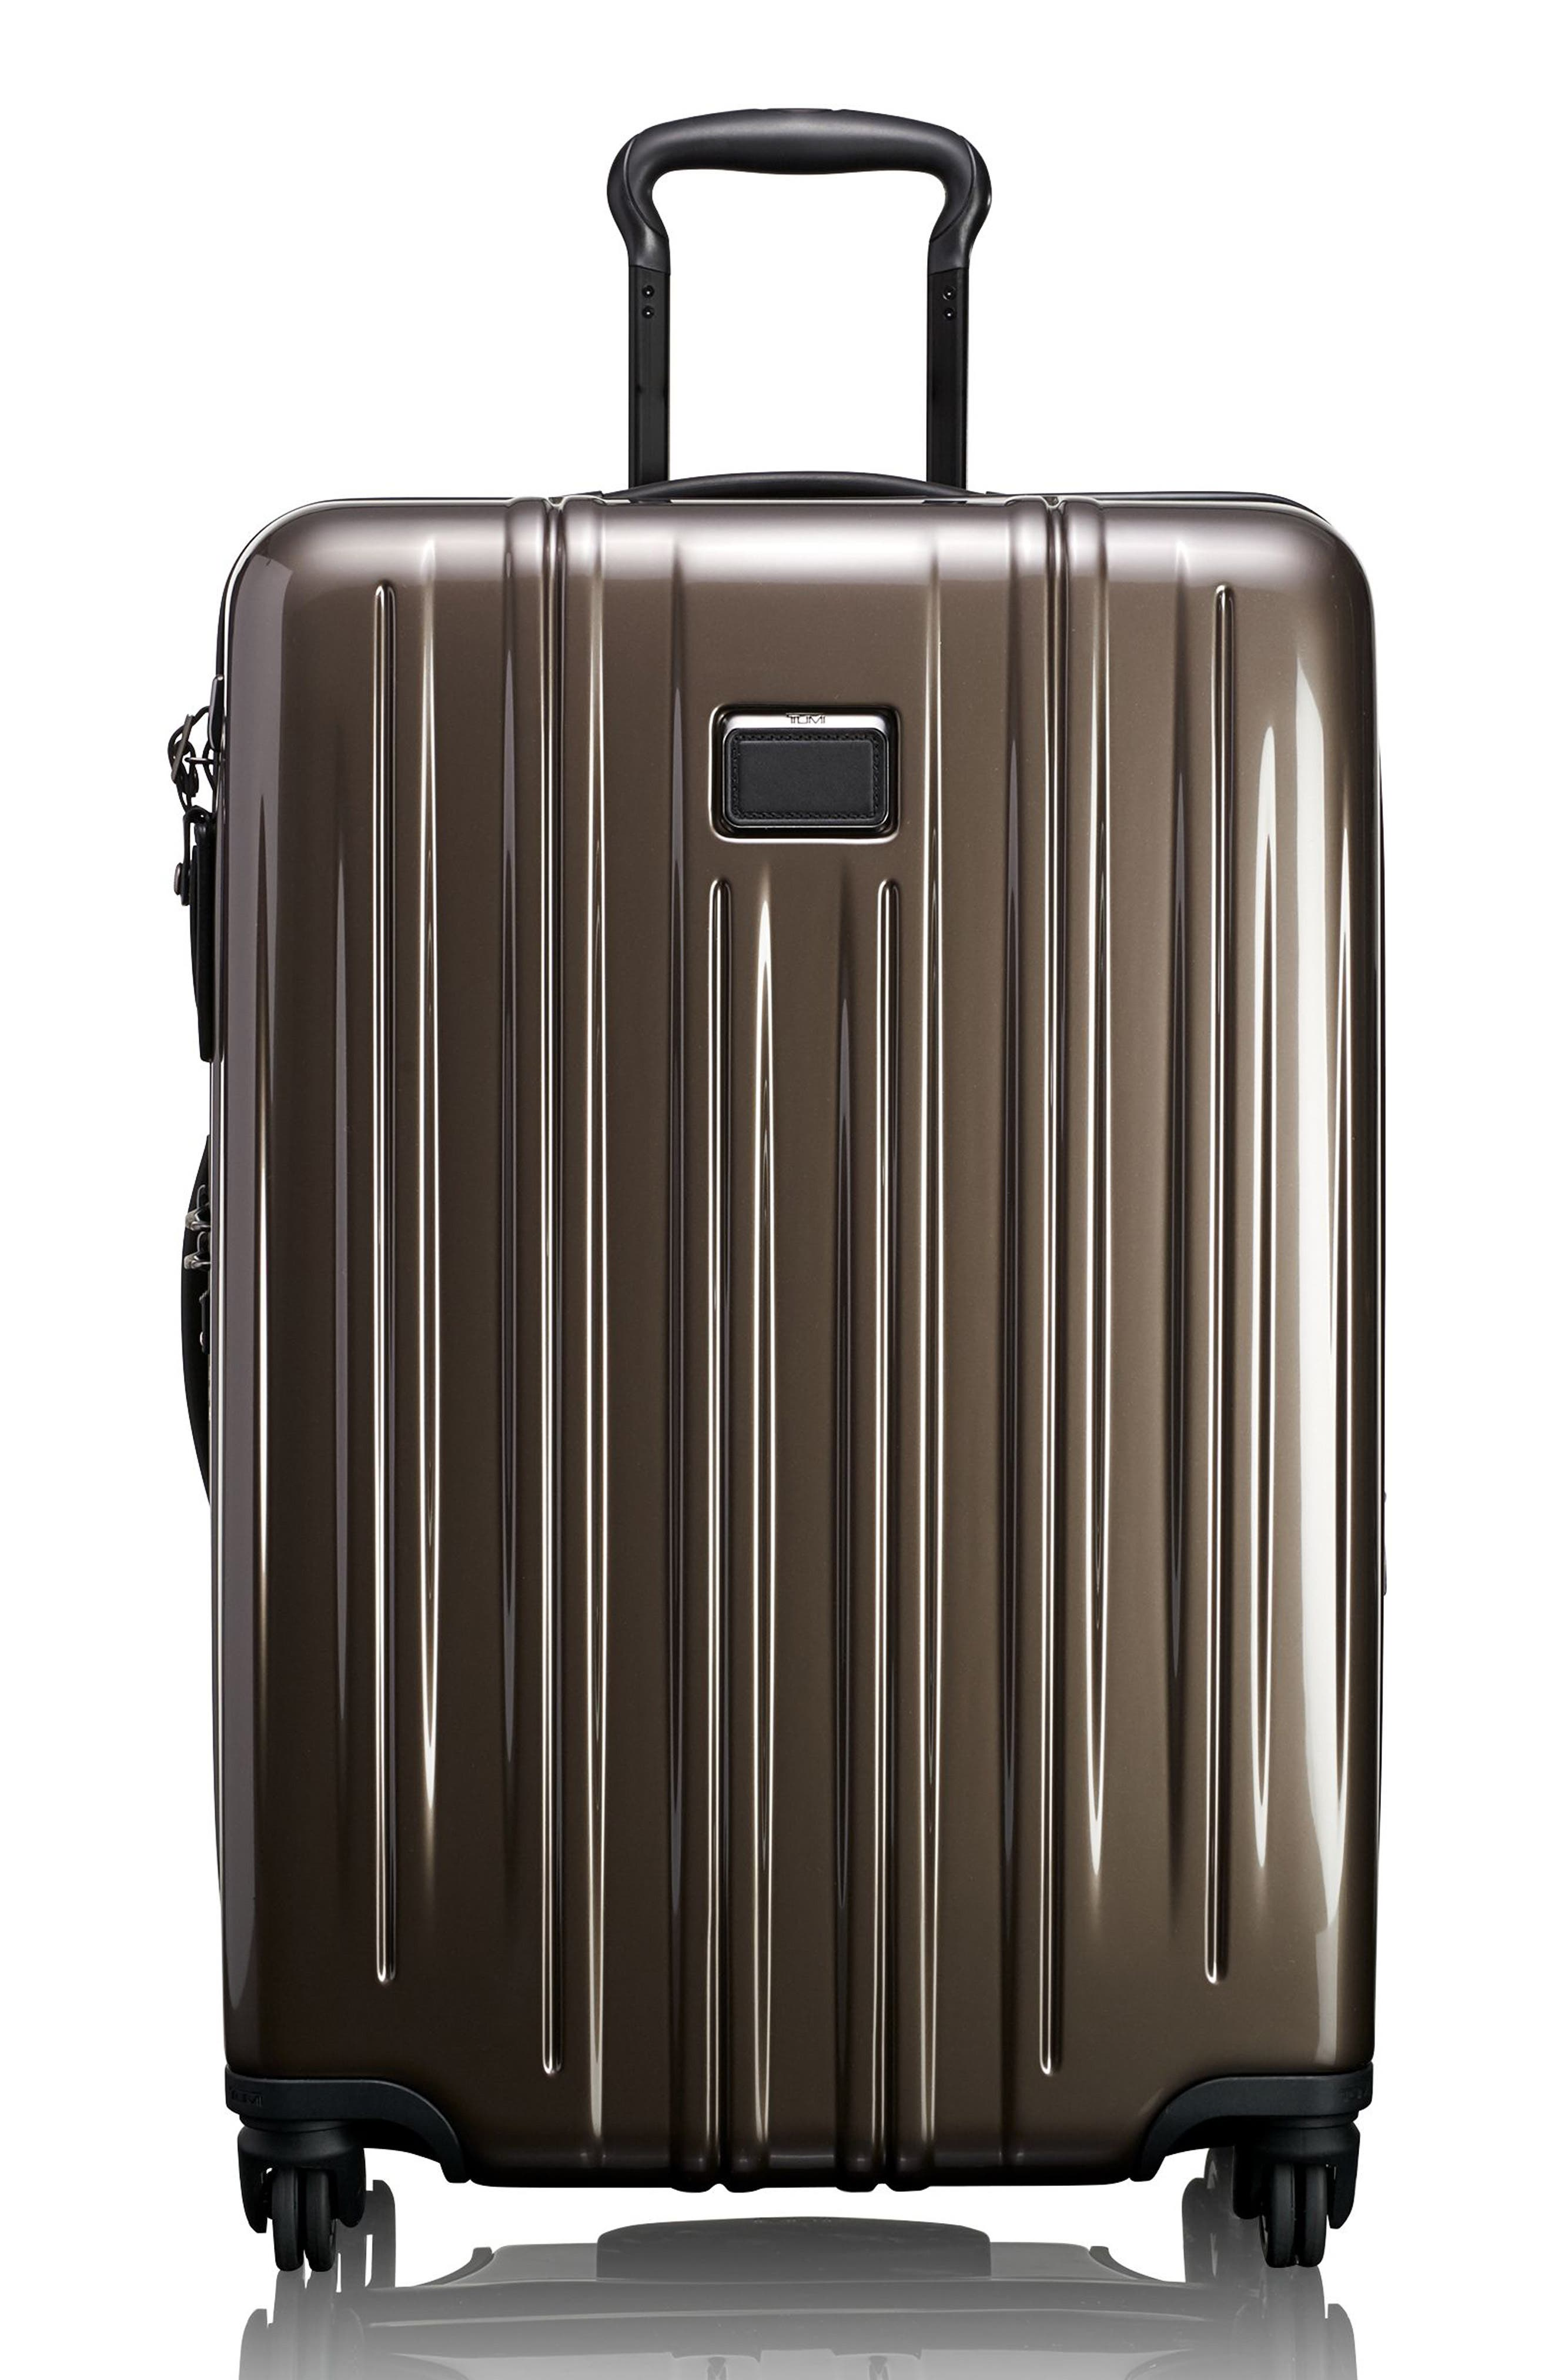 Tumi Short Trip Luggage